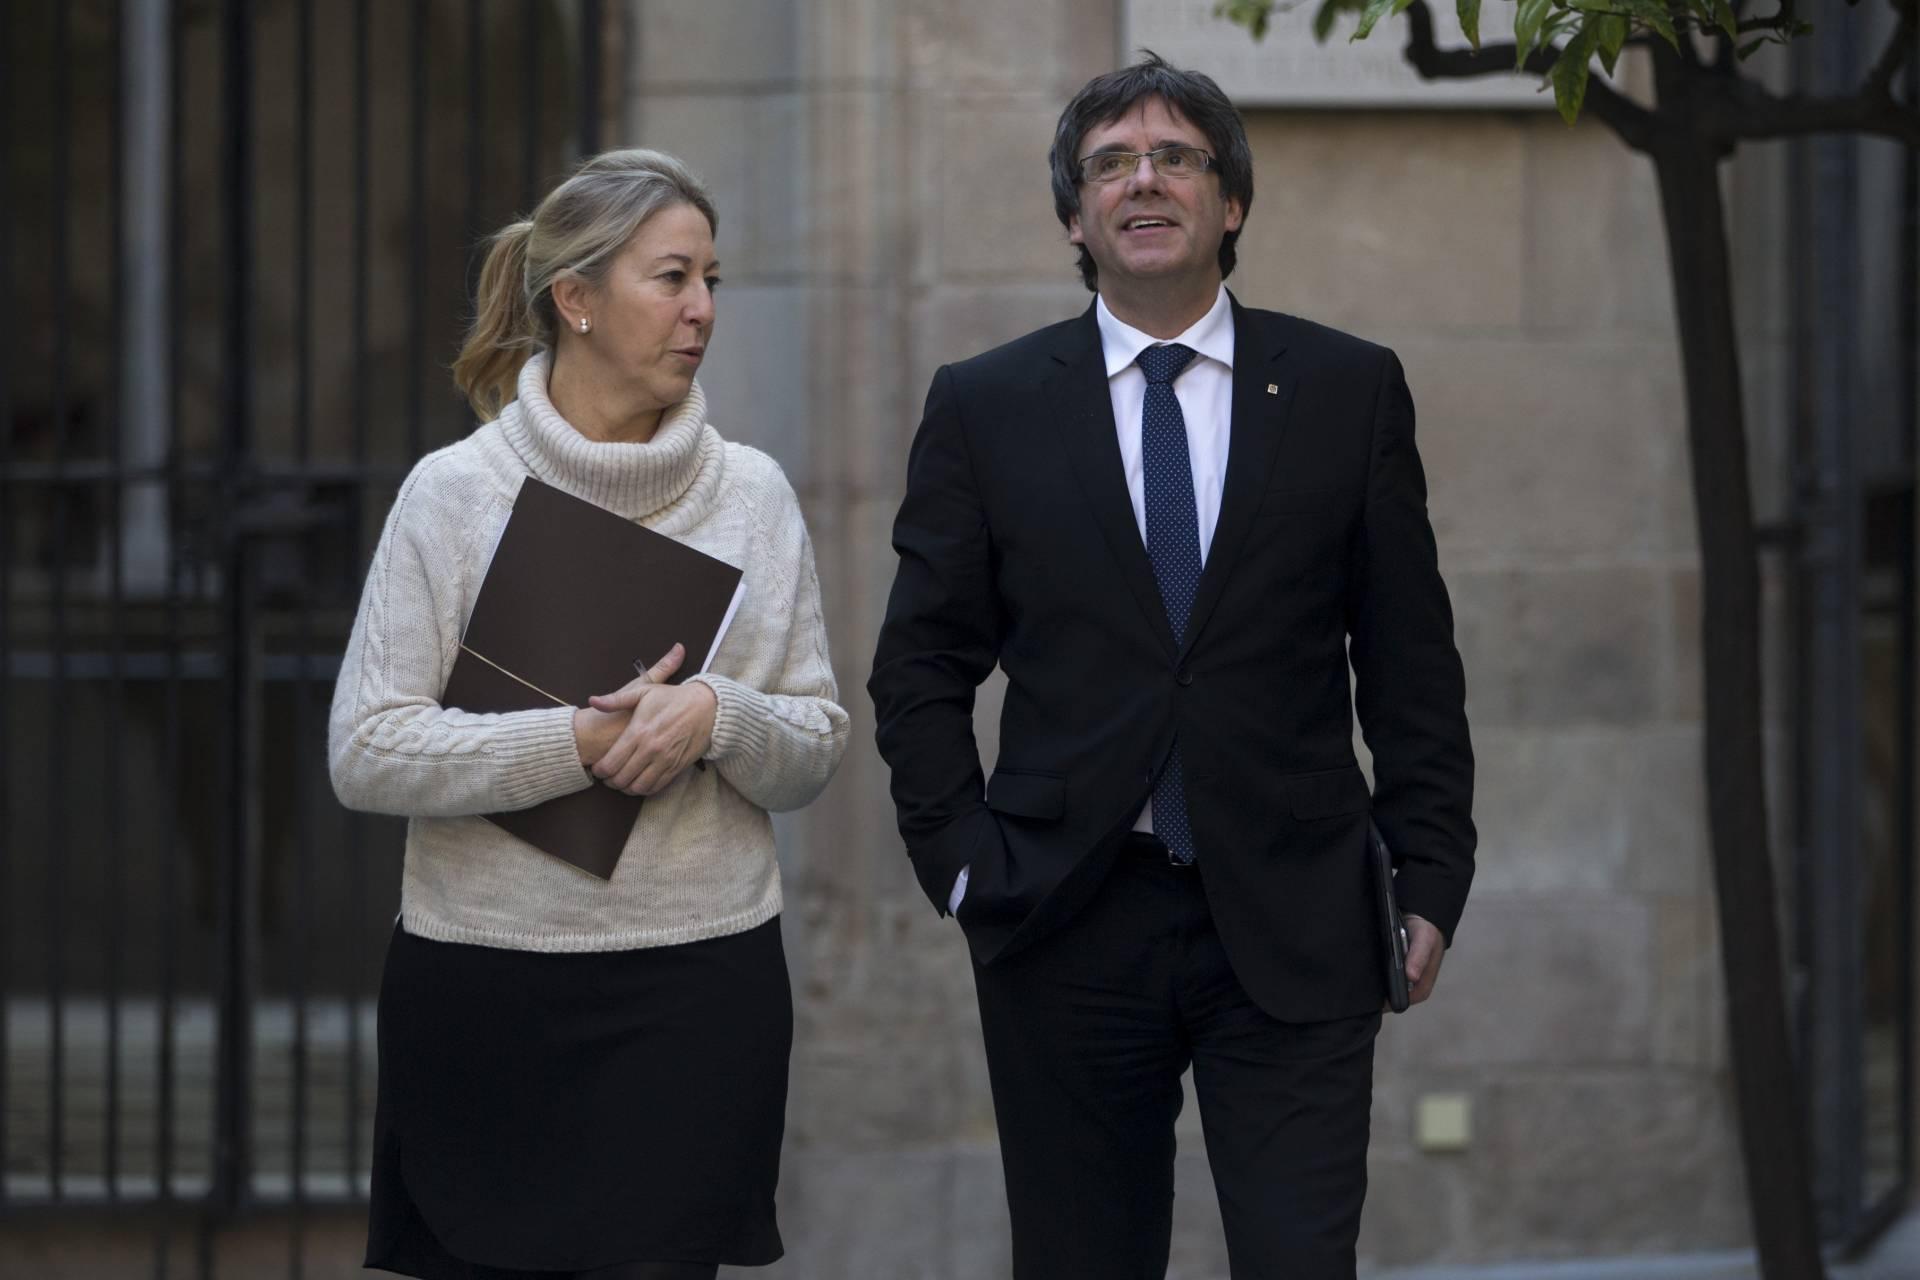 El presidente de la Generalitat, Carles Puigdemont, junto a la portavoz Neus Munté.